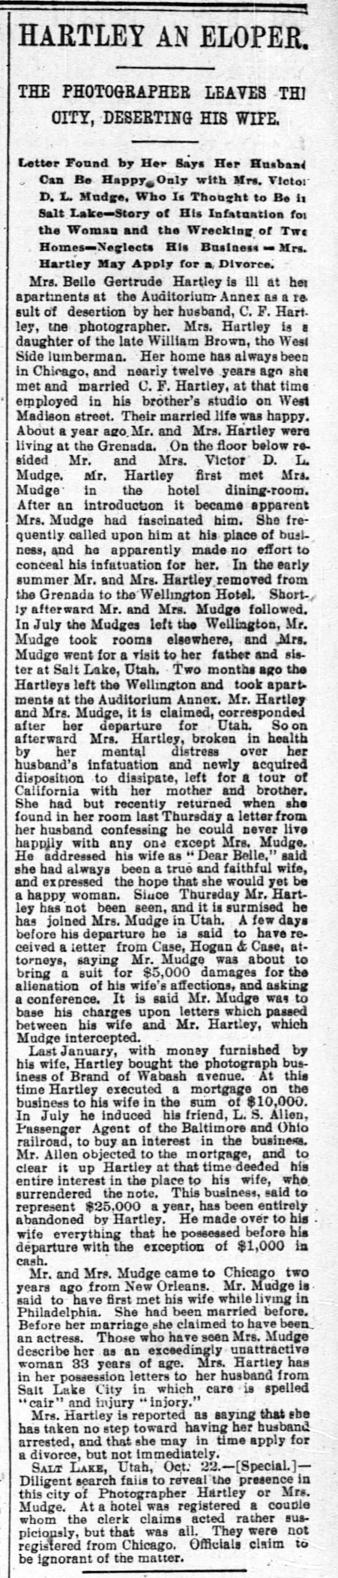 blog 1894 Oct 23 HARTLEY Charles DESERTION Chicago Tribune